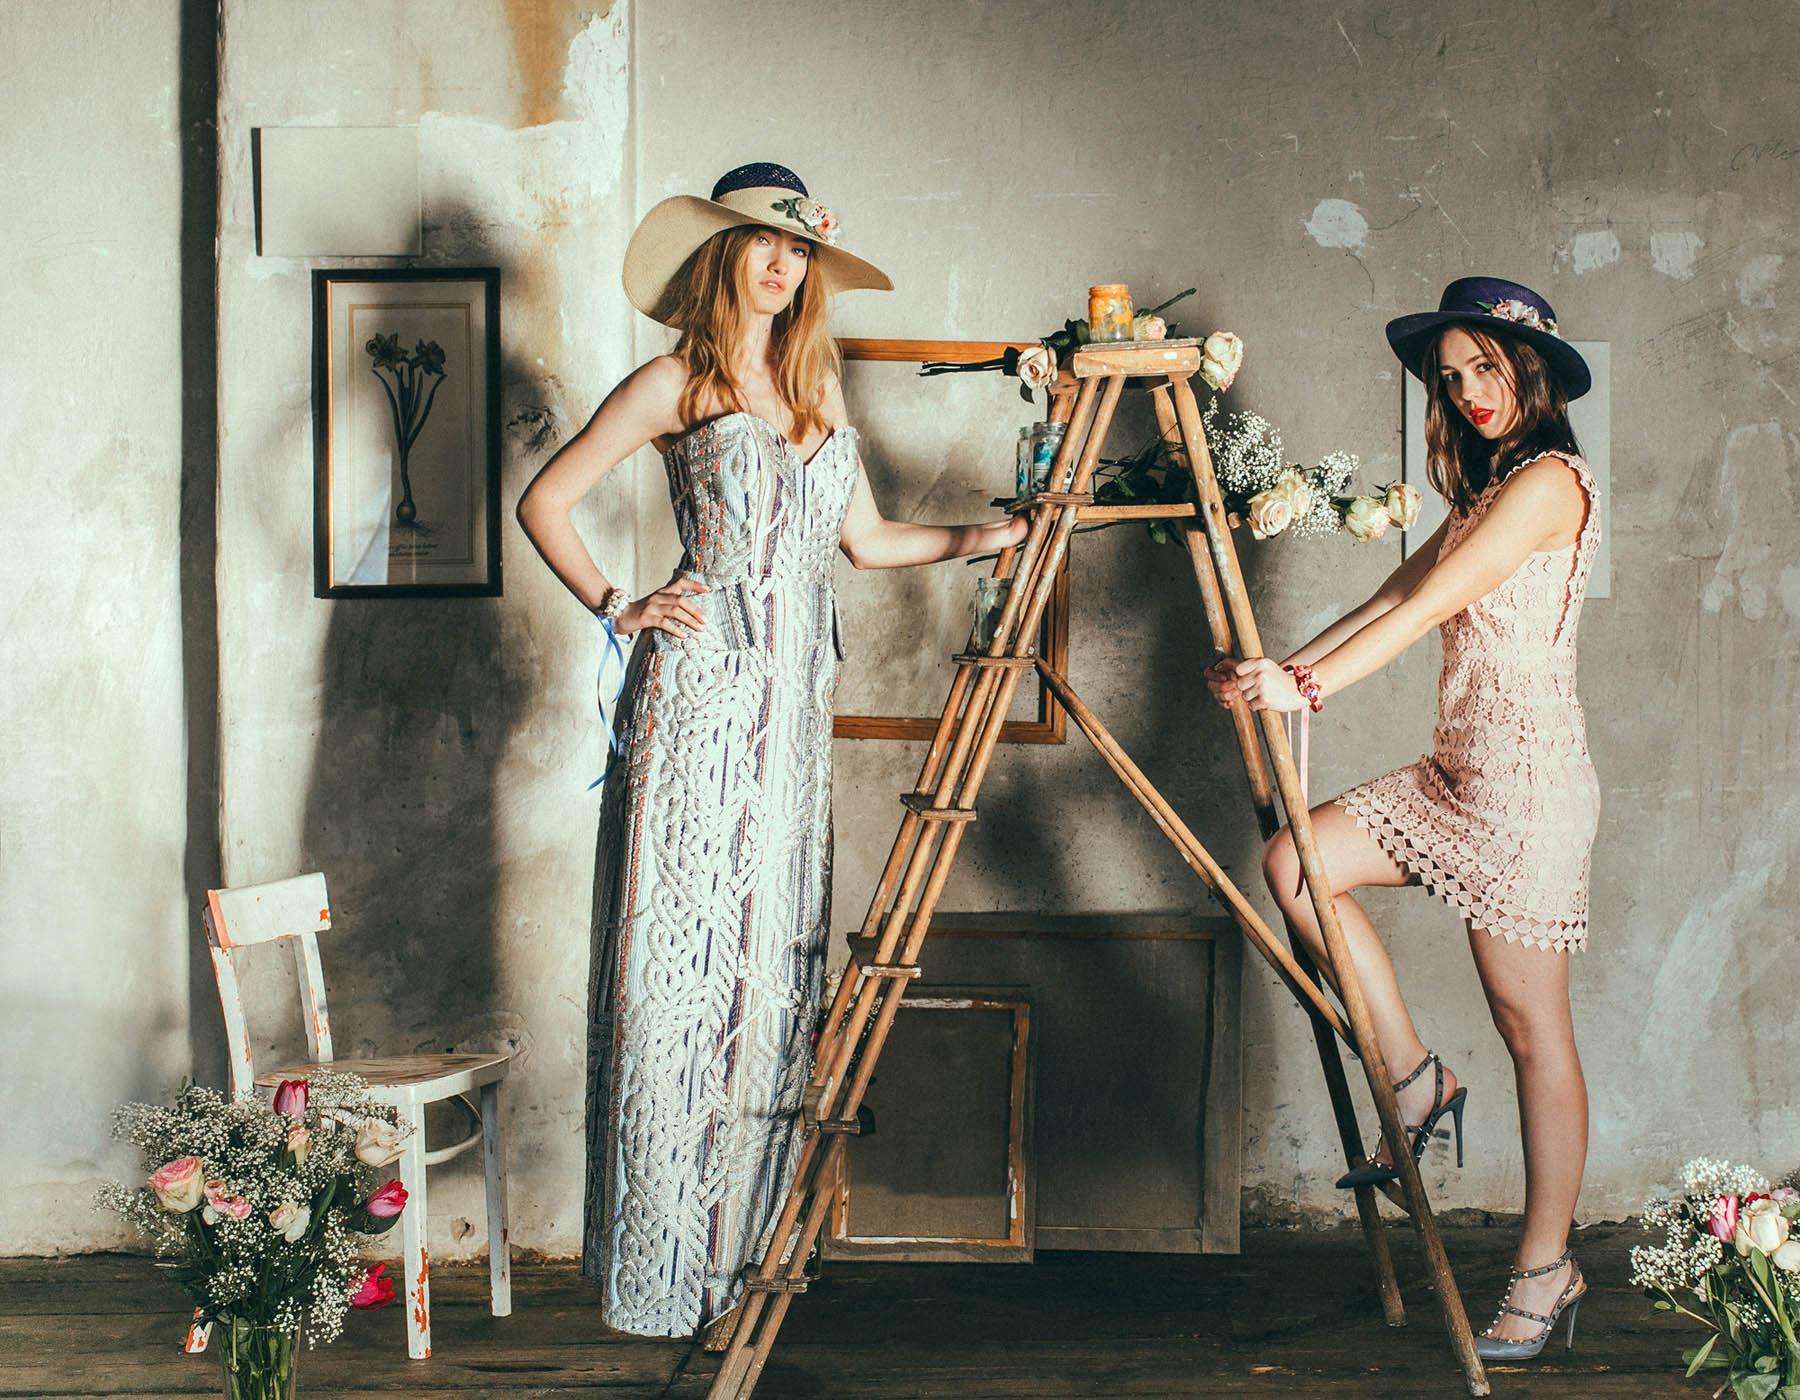 We-Are-Flowergirls_Lookbook_Flowercrown_Blumenkranz_SS17_c_Lupi-Spuma_Web_09.jpg